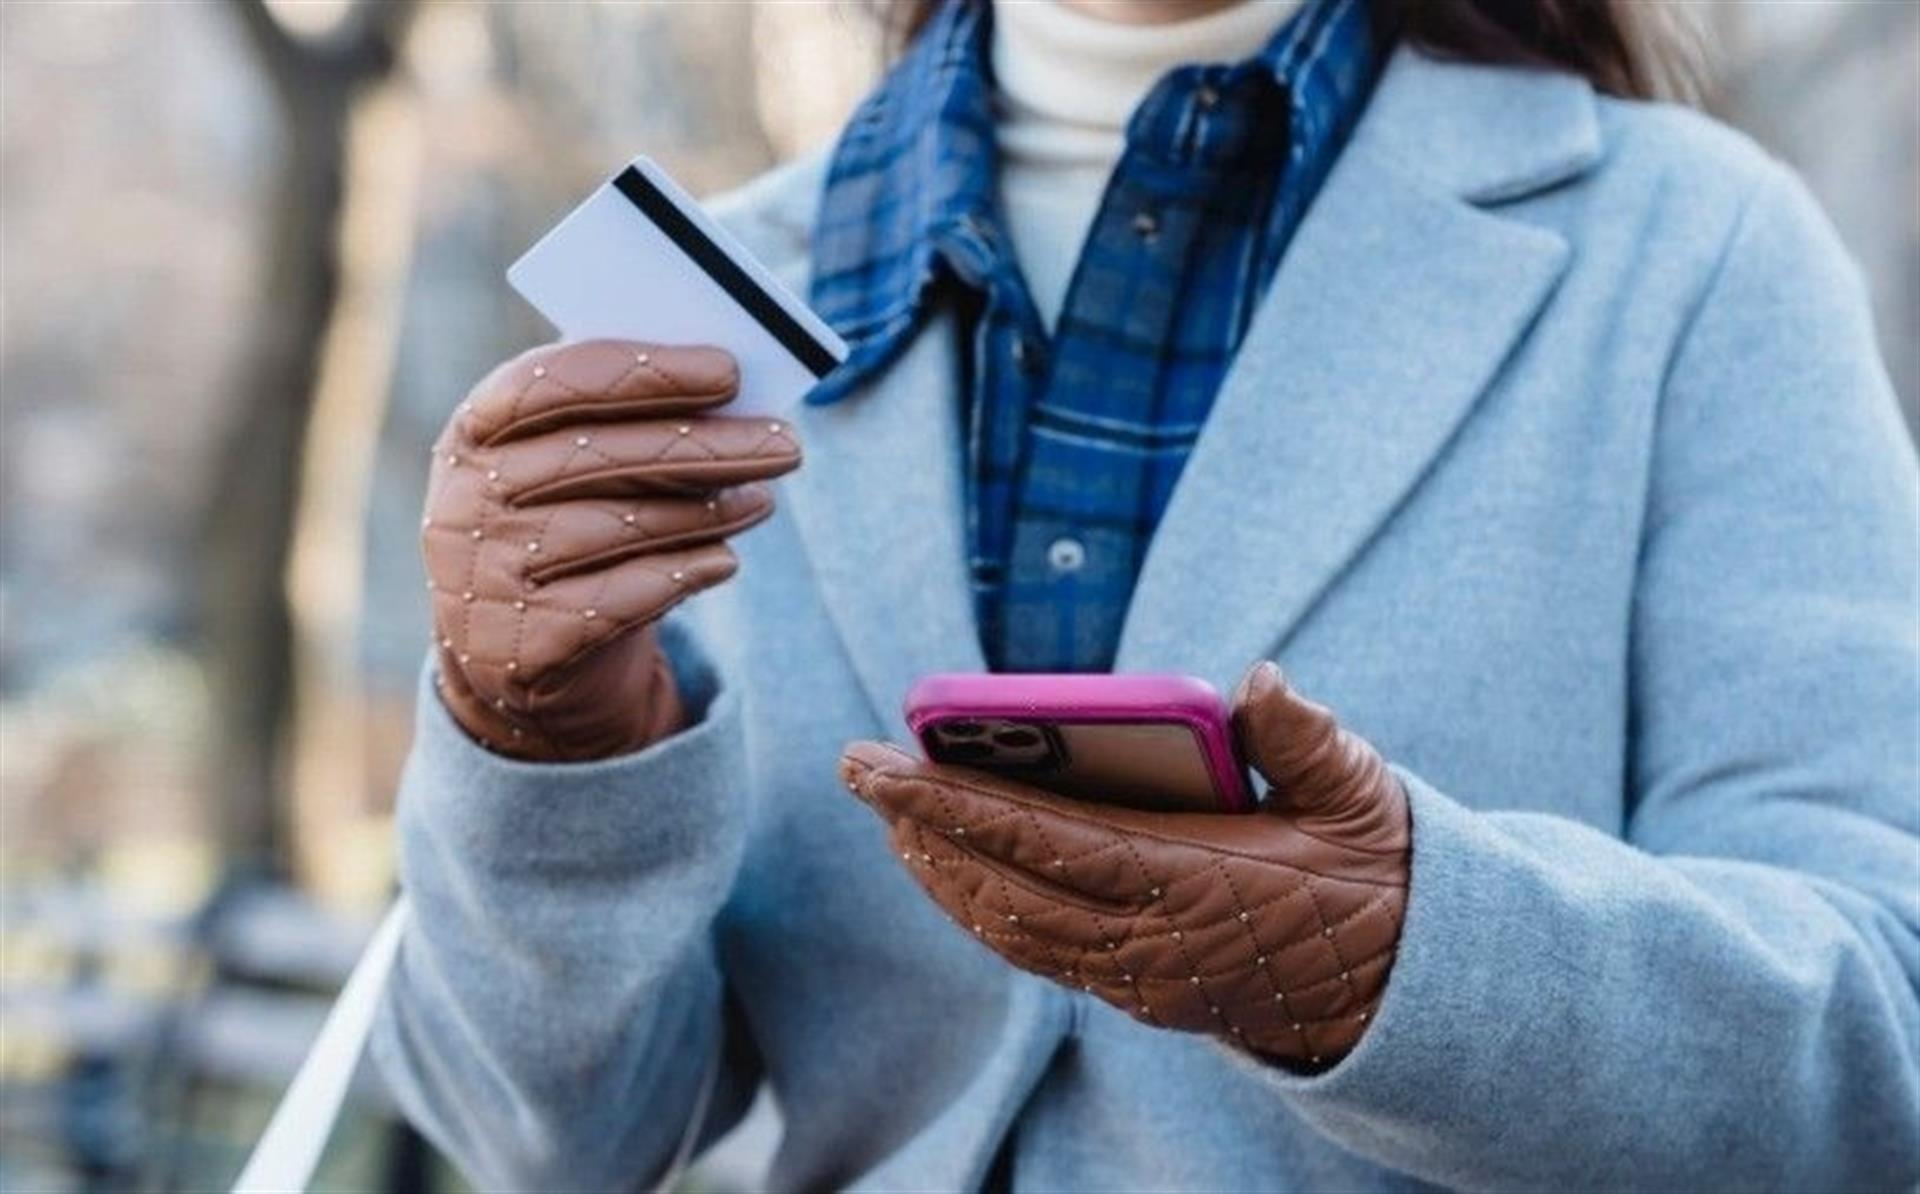 Comprar móvil baratoAutor: Tecnomari - Tienda de móviles